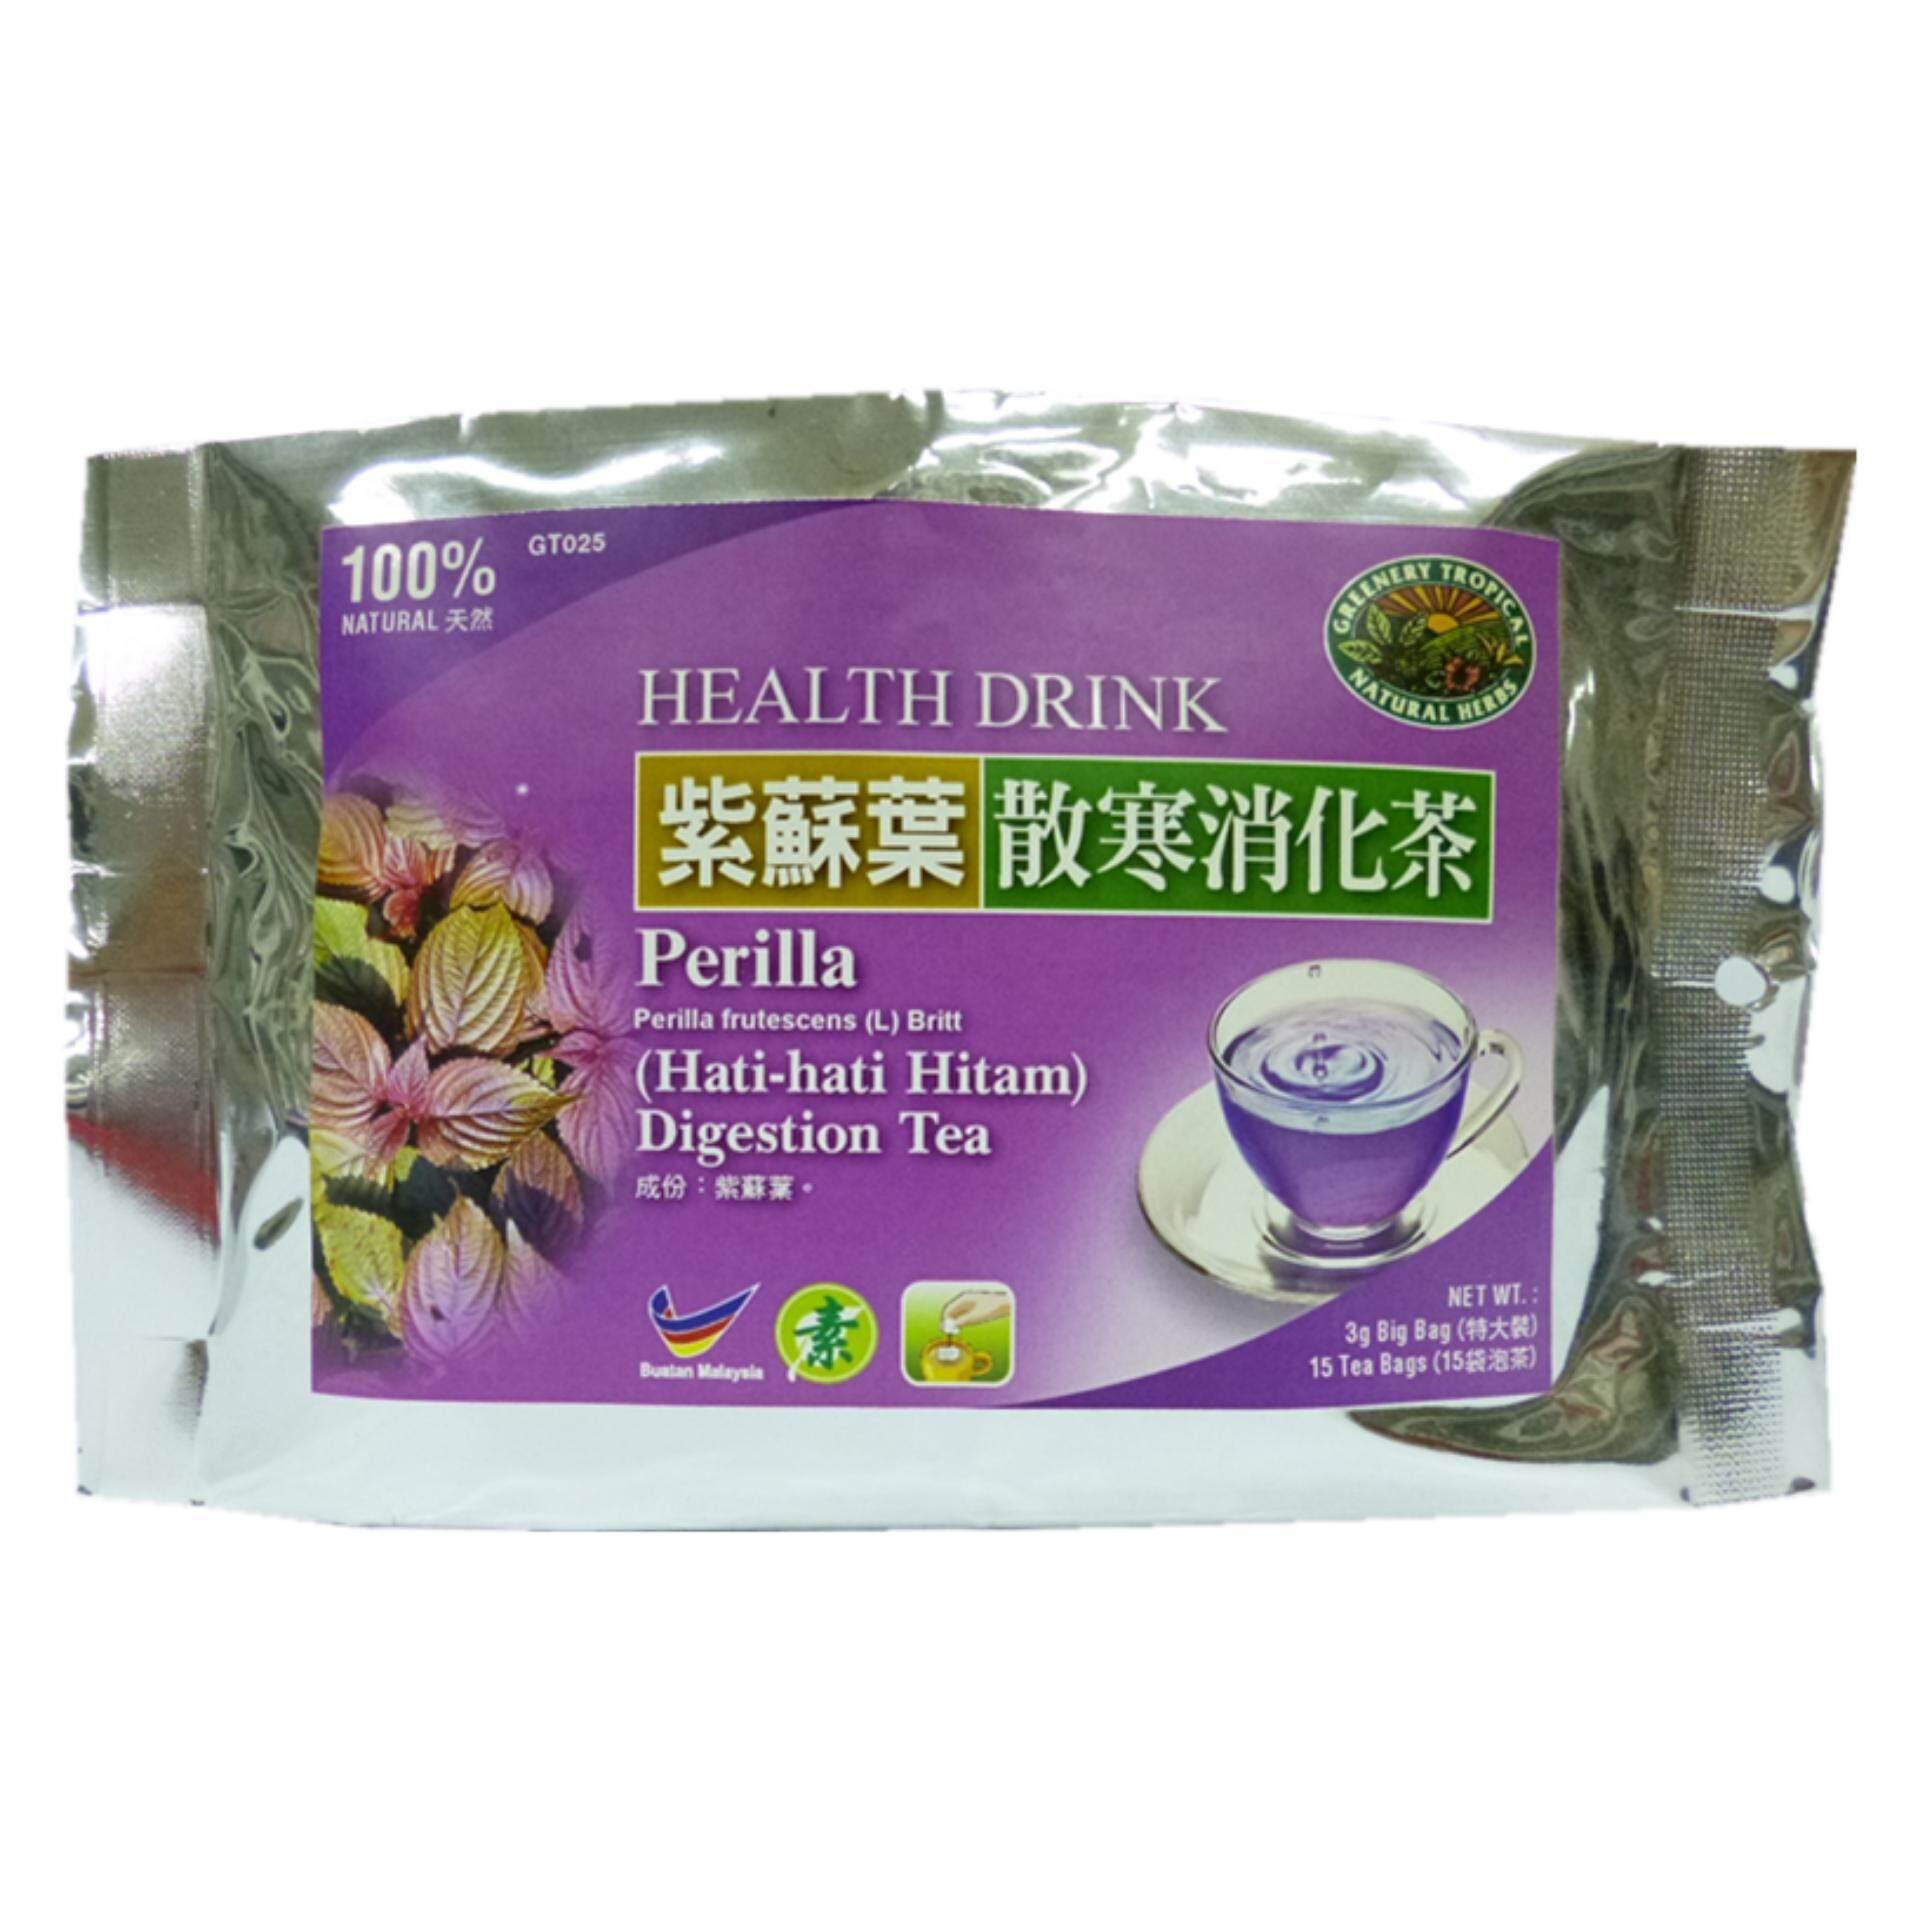 PerillaDispelling Cold & Digestion Health